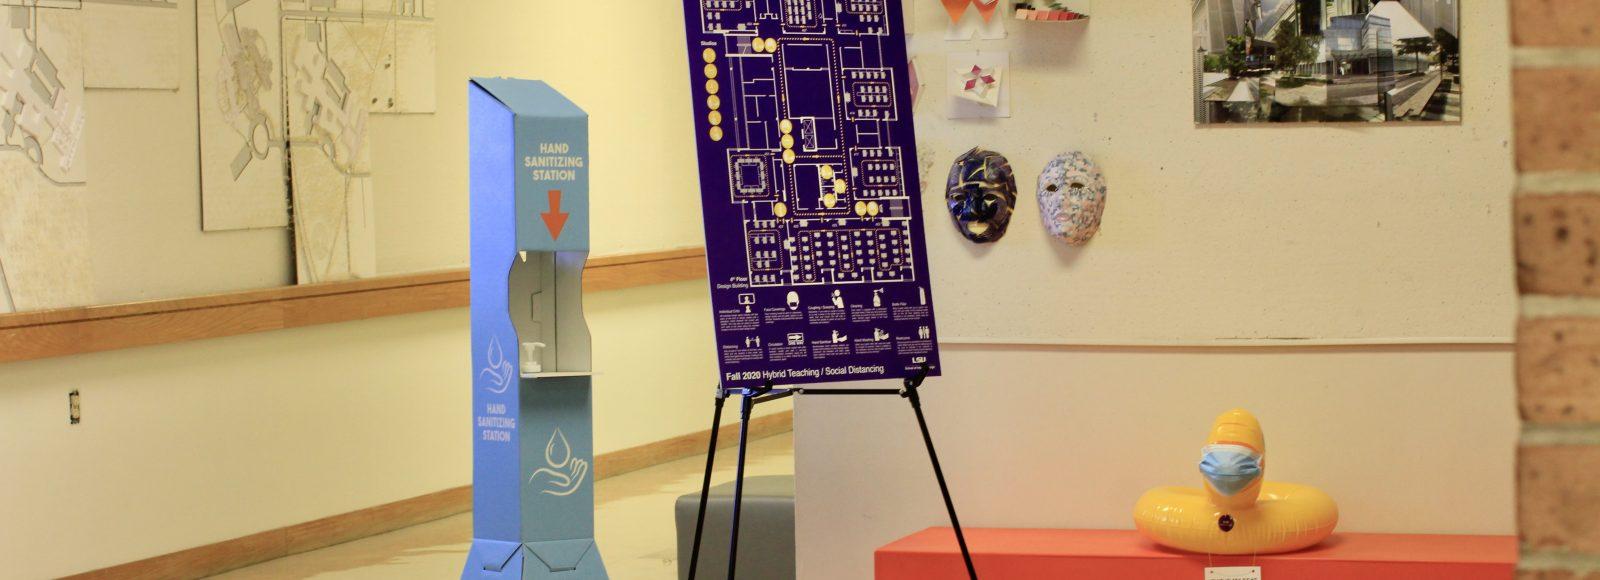 Floorplan sign and hand sanitizer station